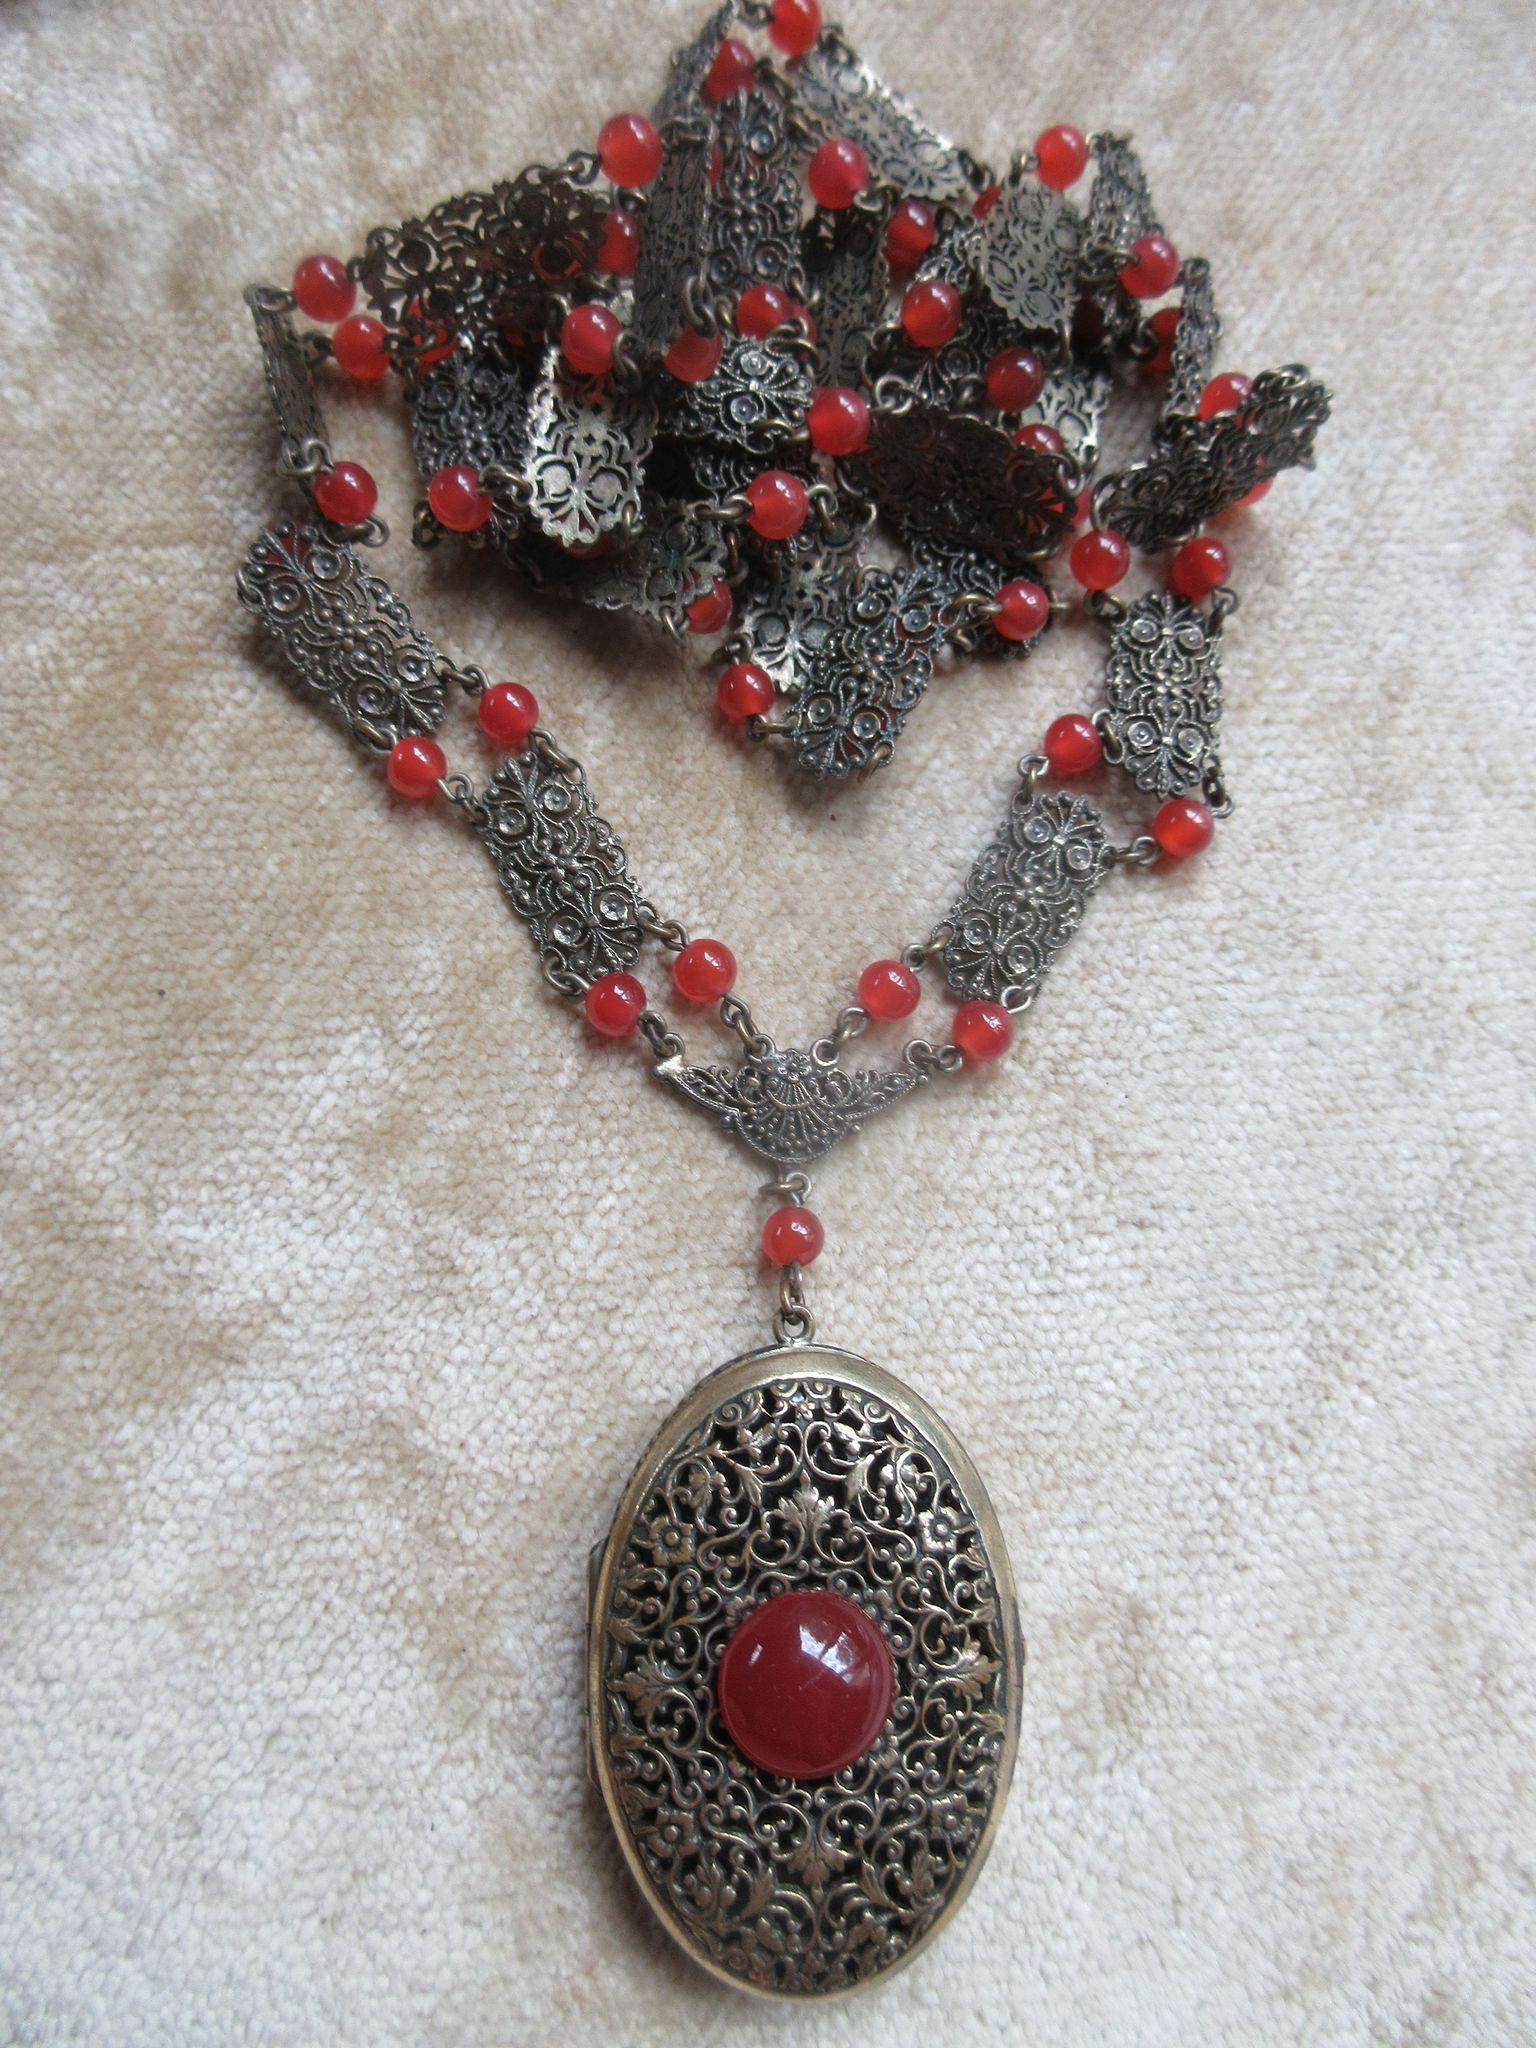 Vintage Czech Filigree Vinaigrette Locket Necklace